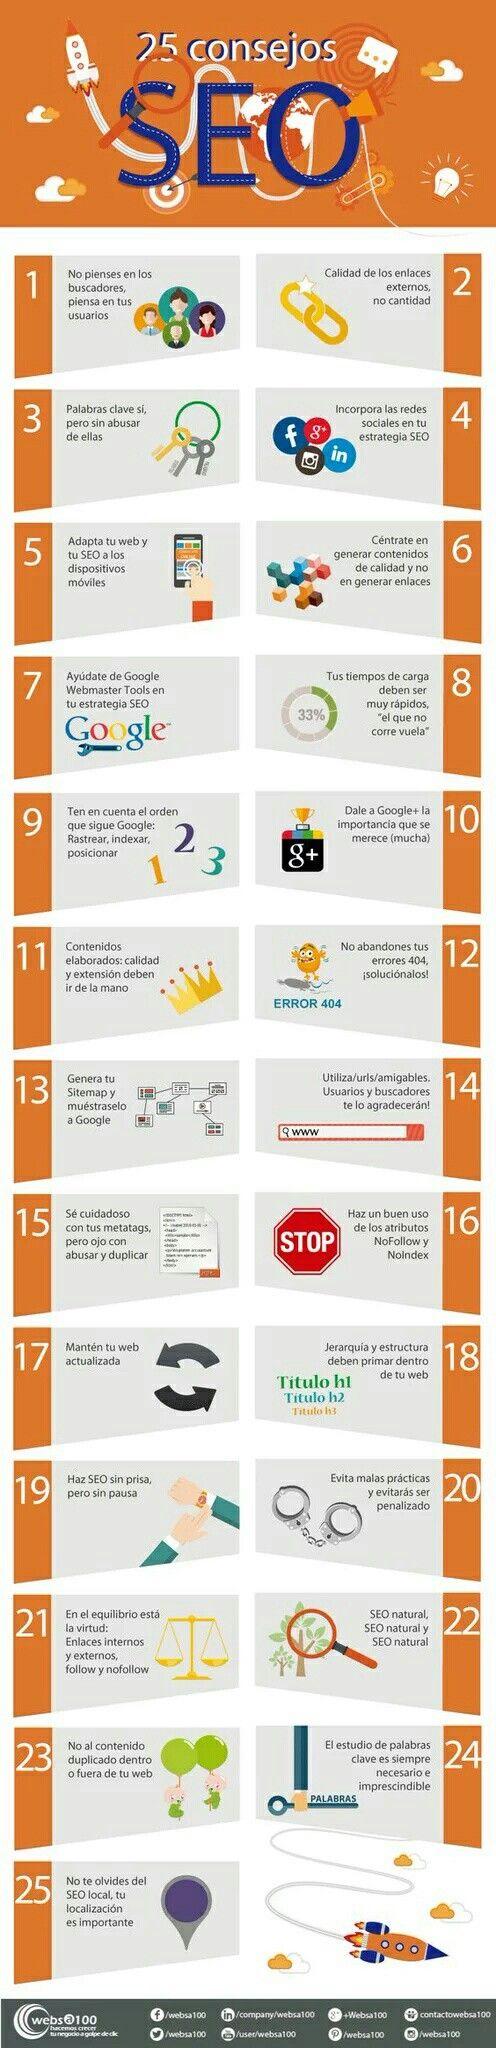 25 Consejos SEO